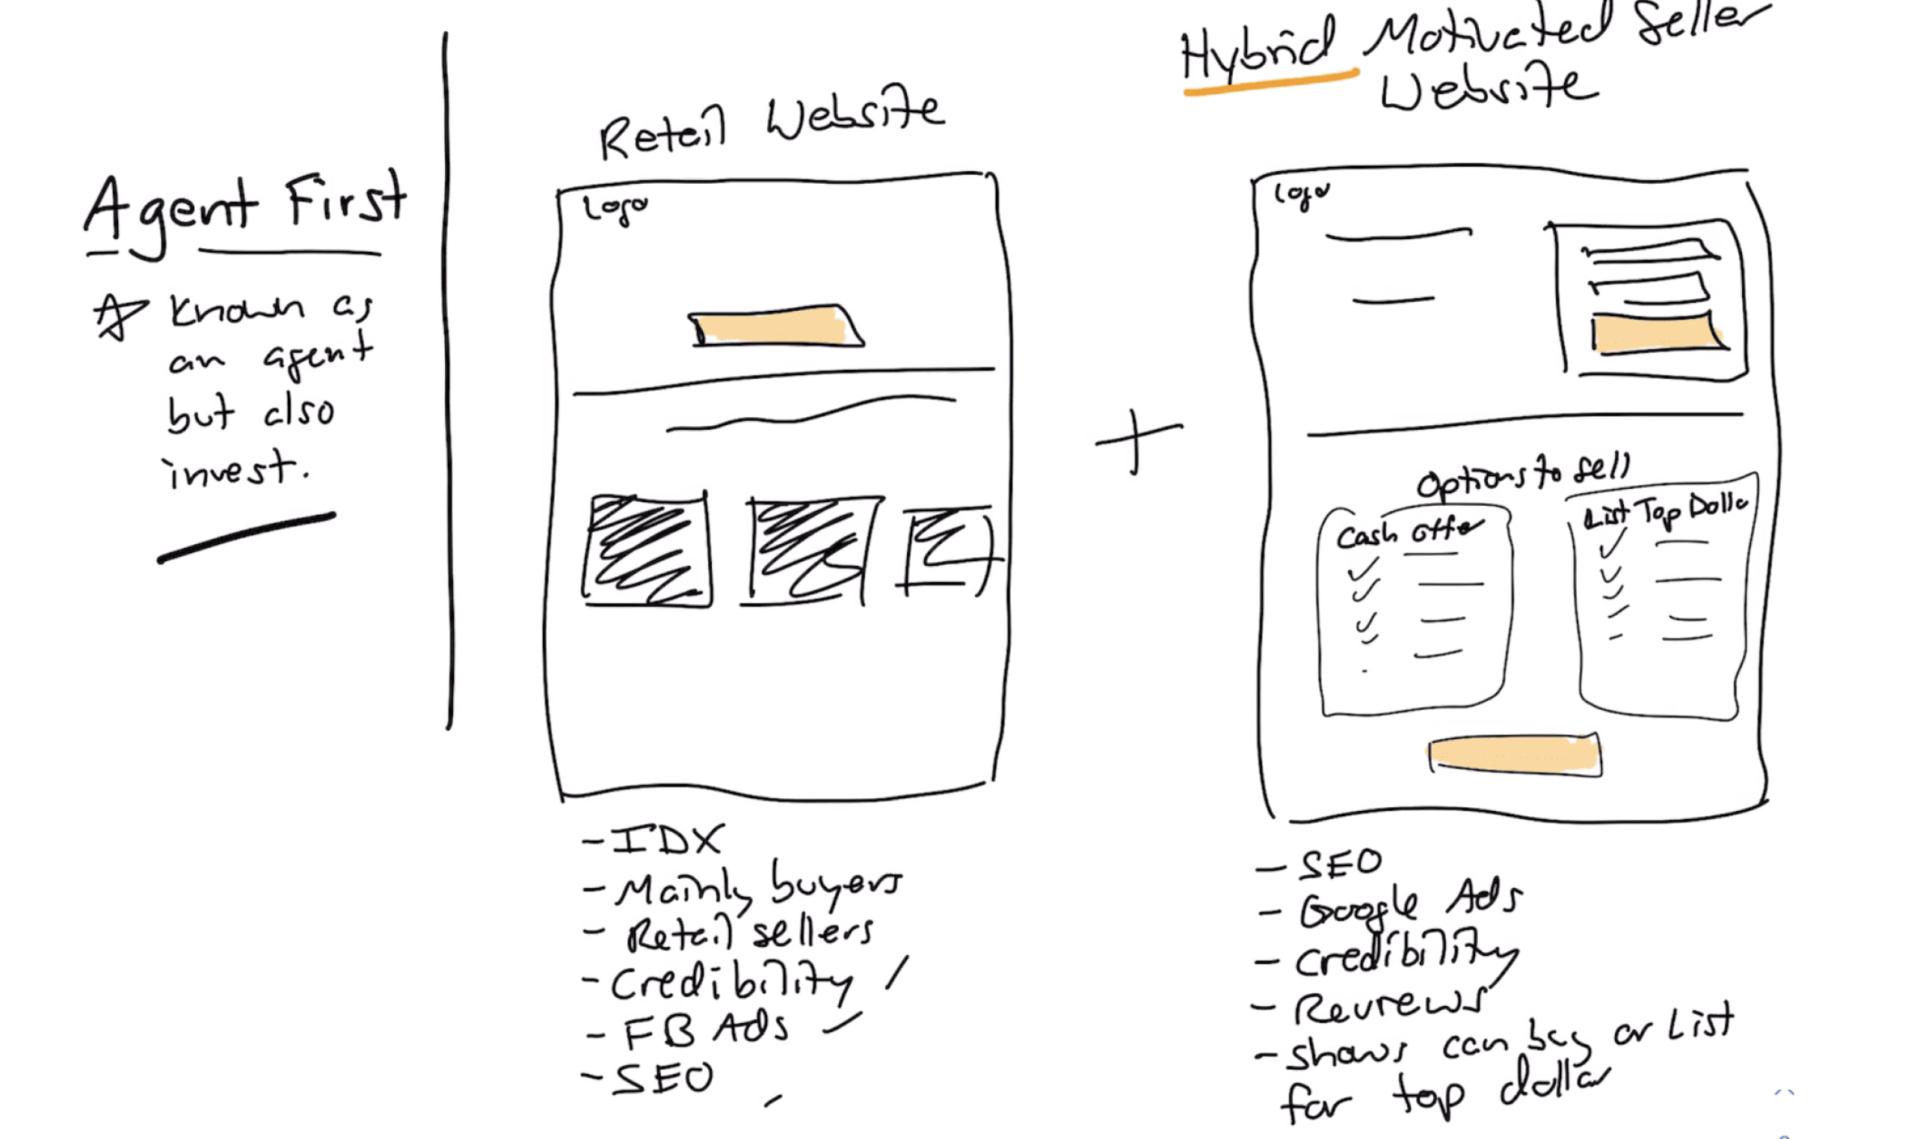 hybrid motivated seller website approach